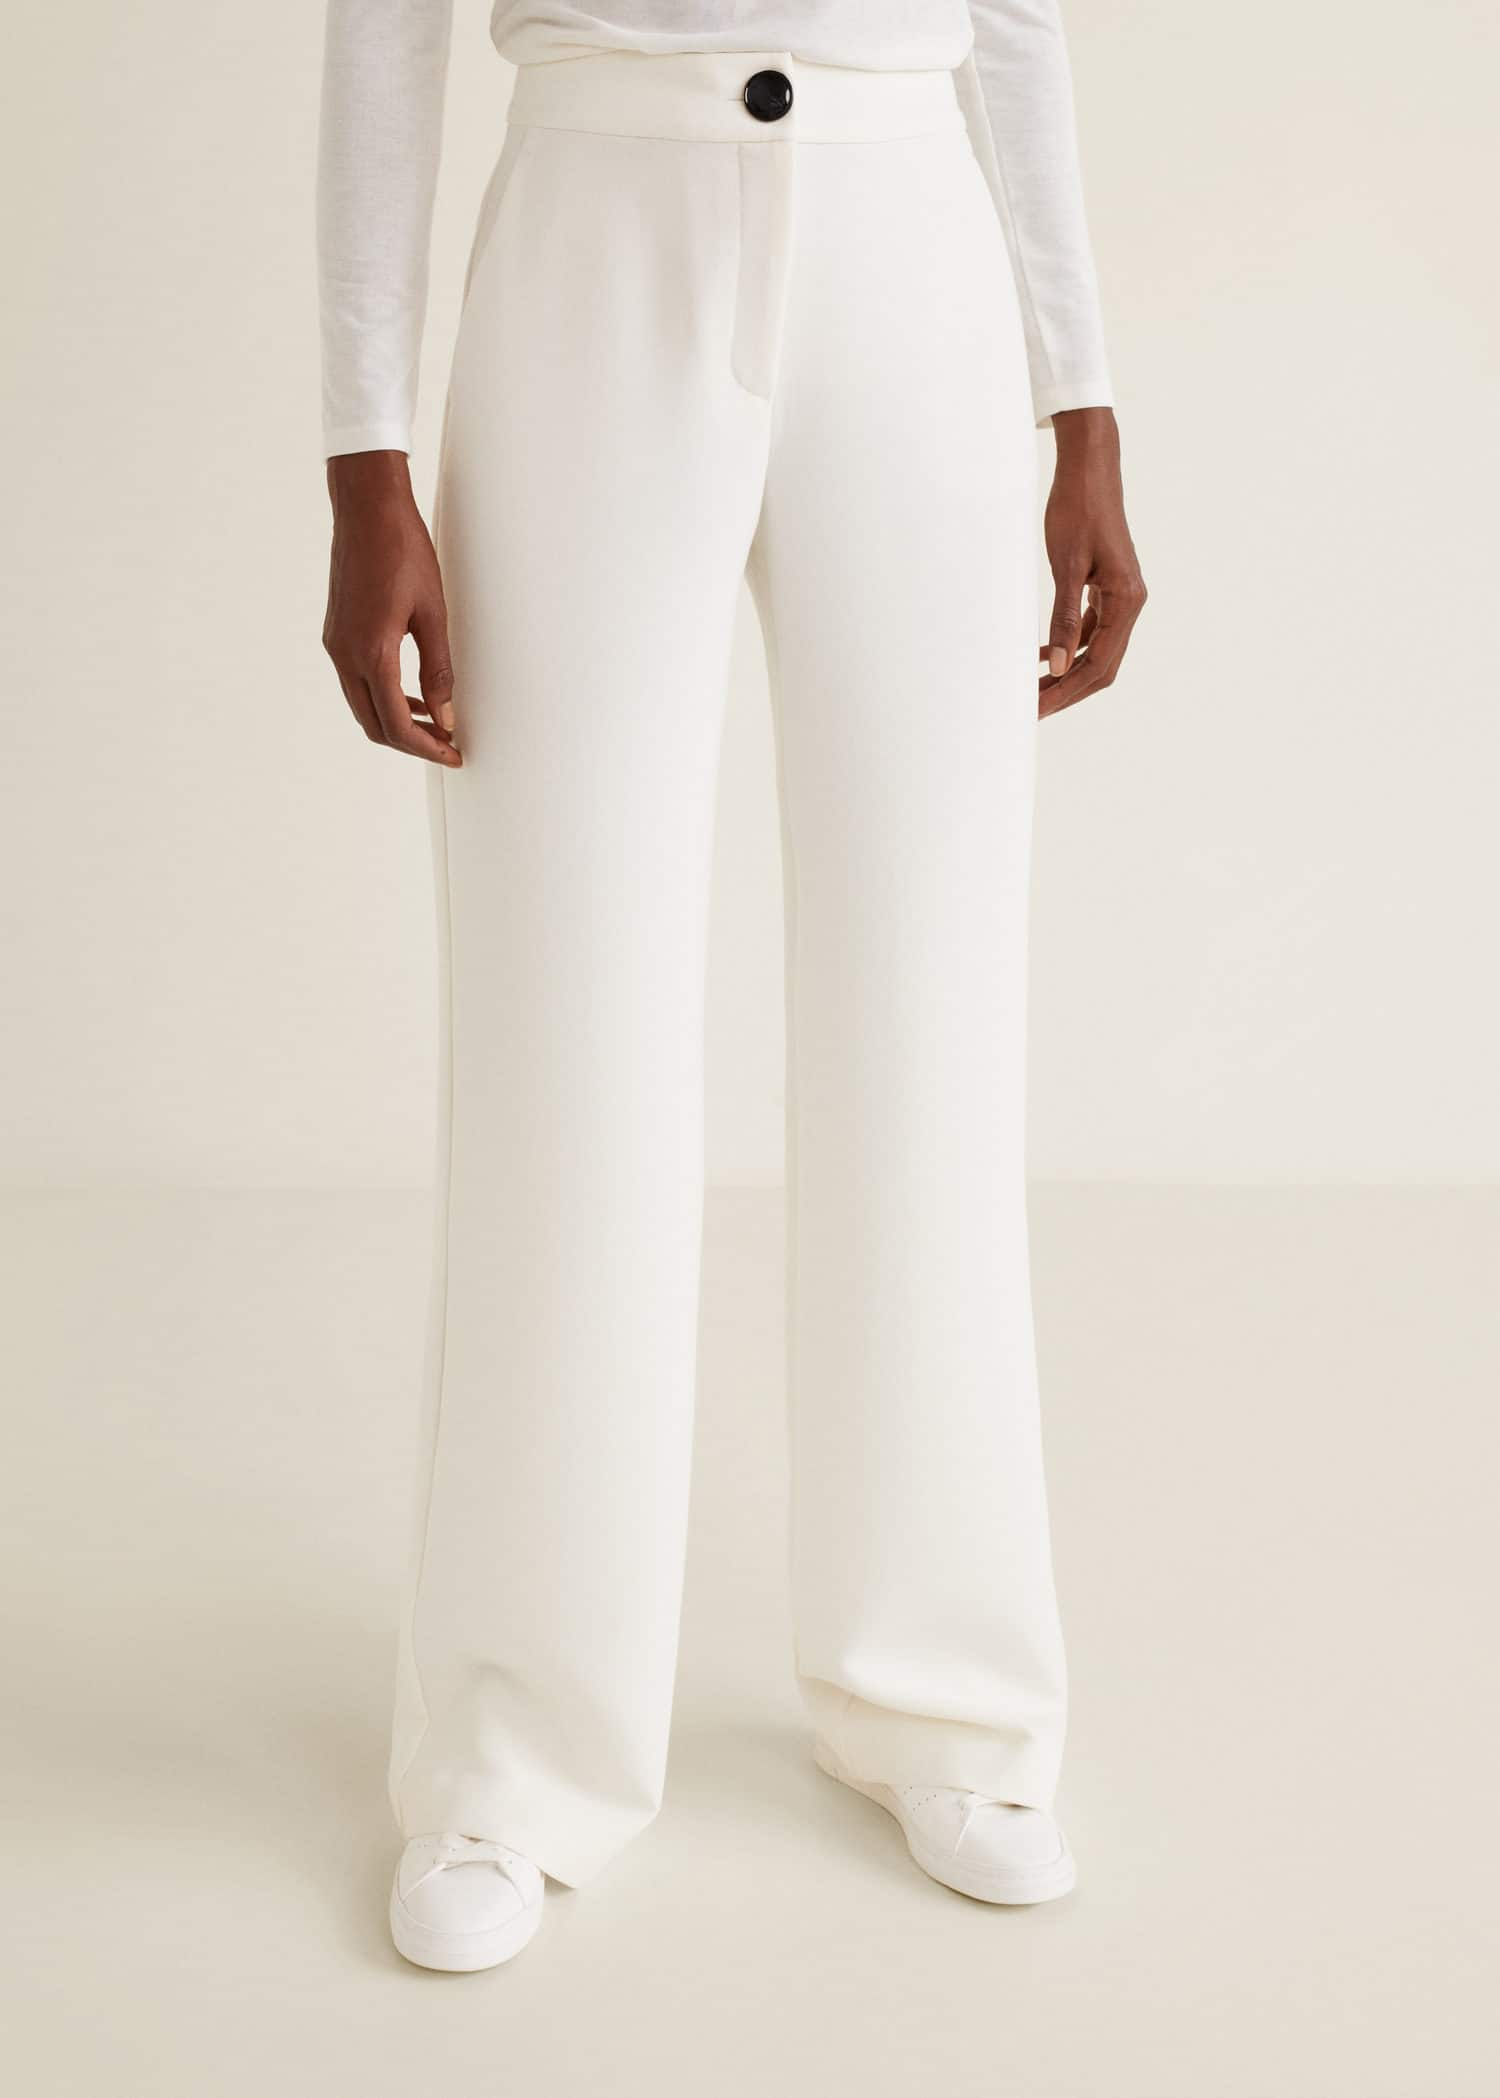 pantalon femme mango